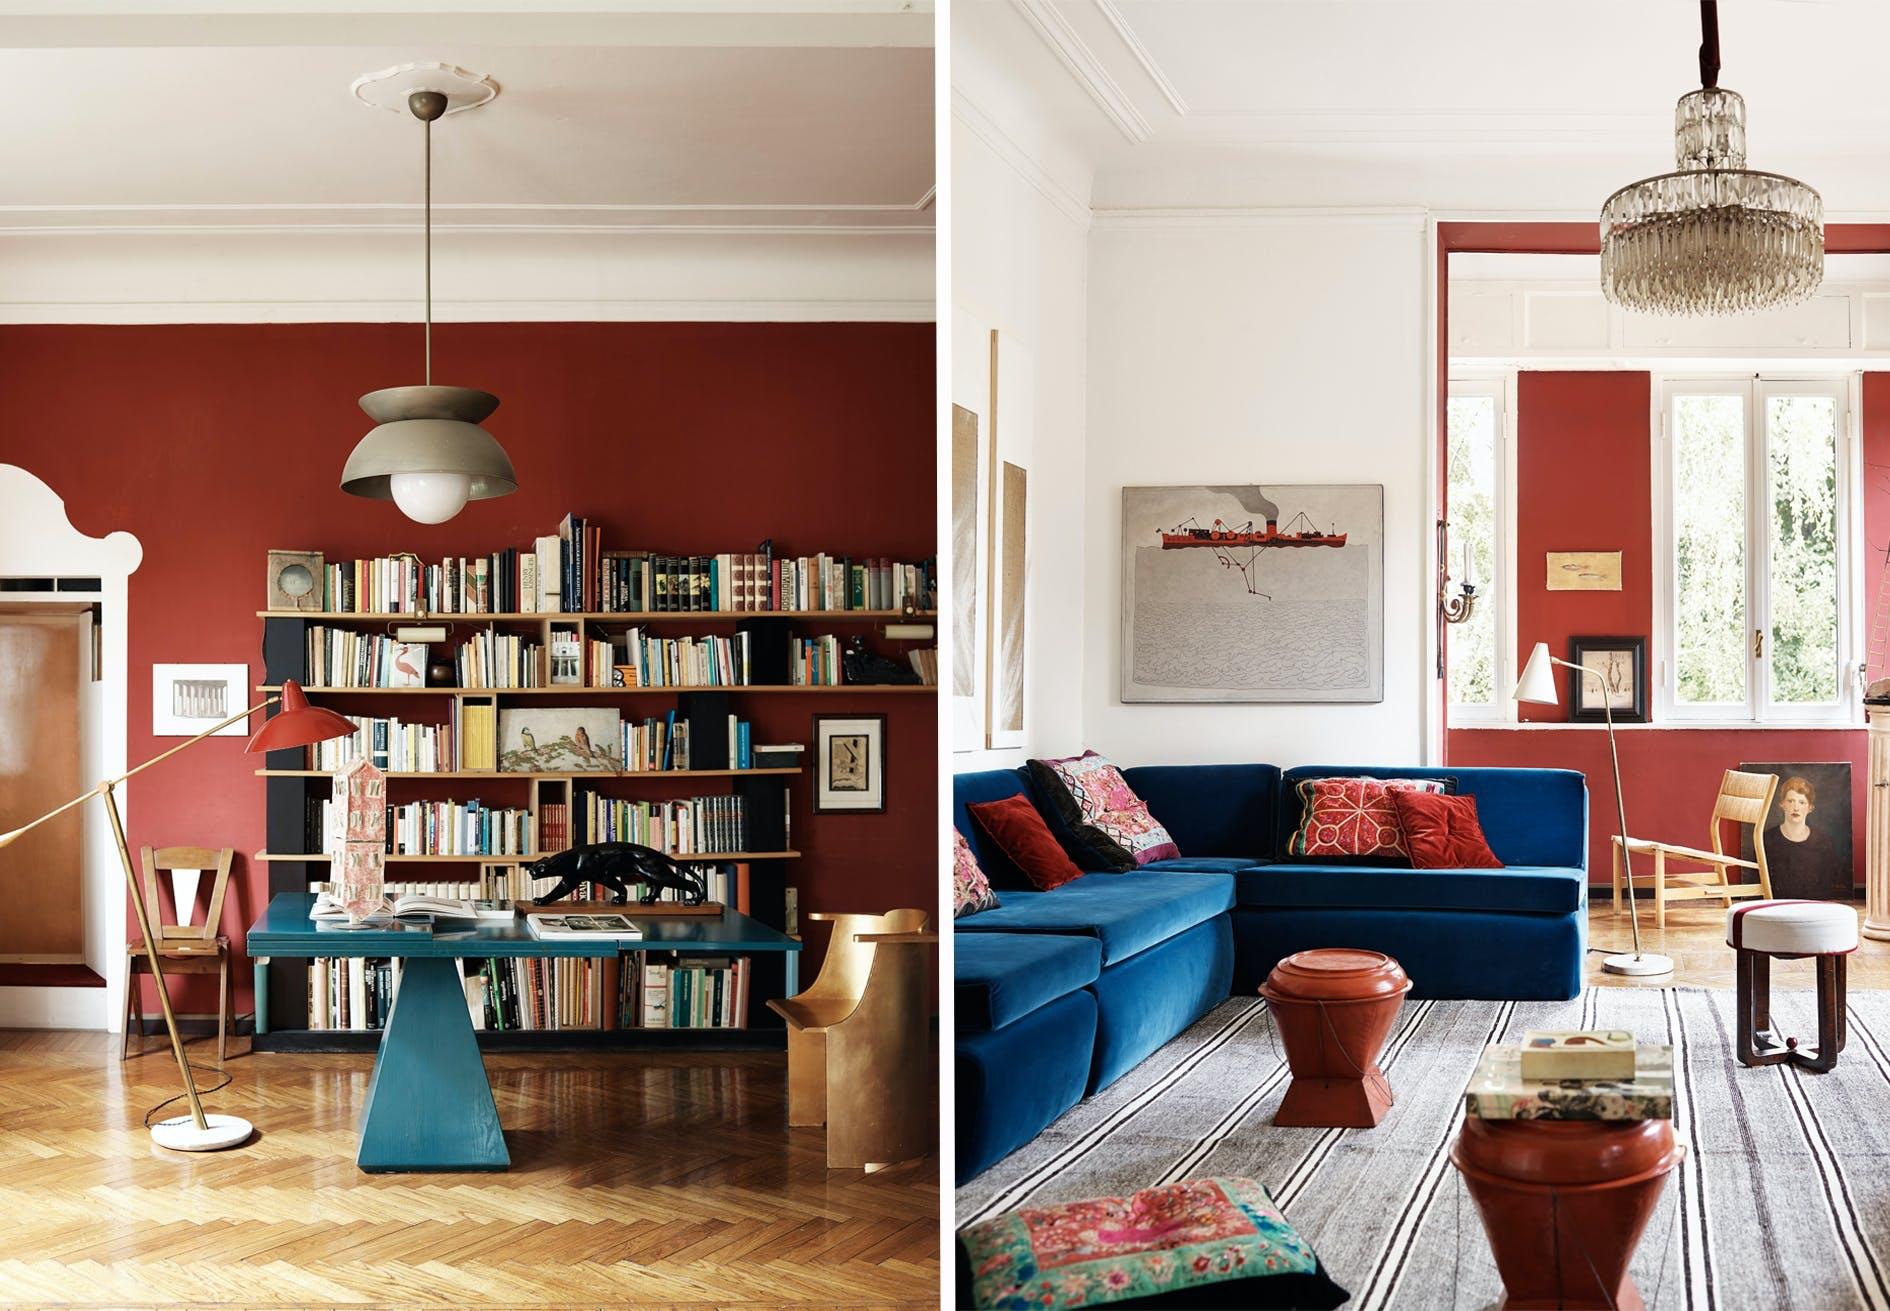 stefano vitali home bolig galleri hus